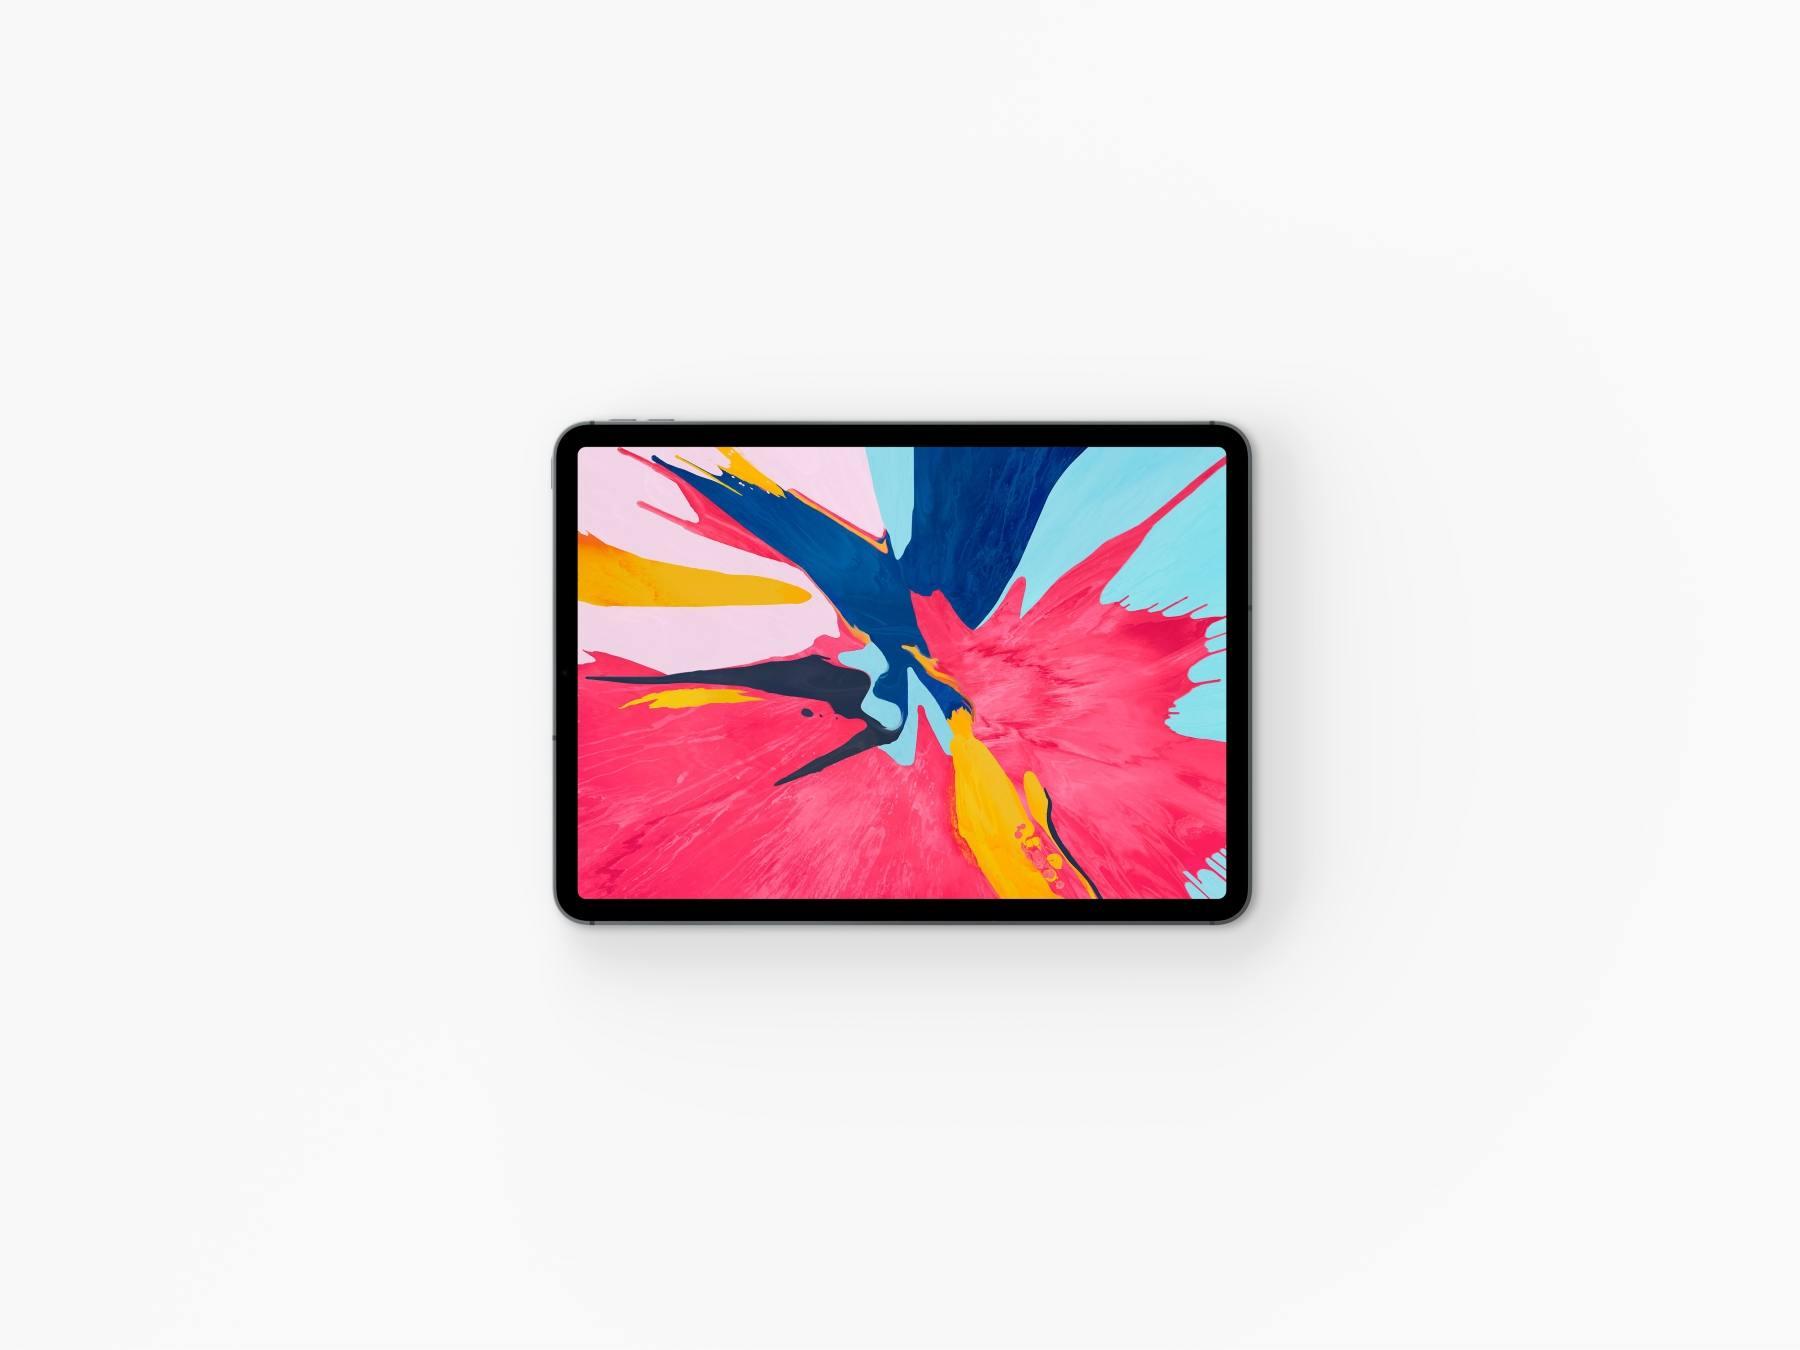 1569728405 24d64691e4b7a8f - 苹果iPad Pro UI样机